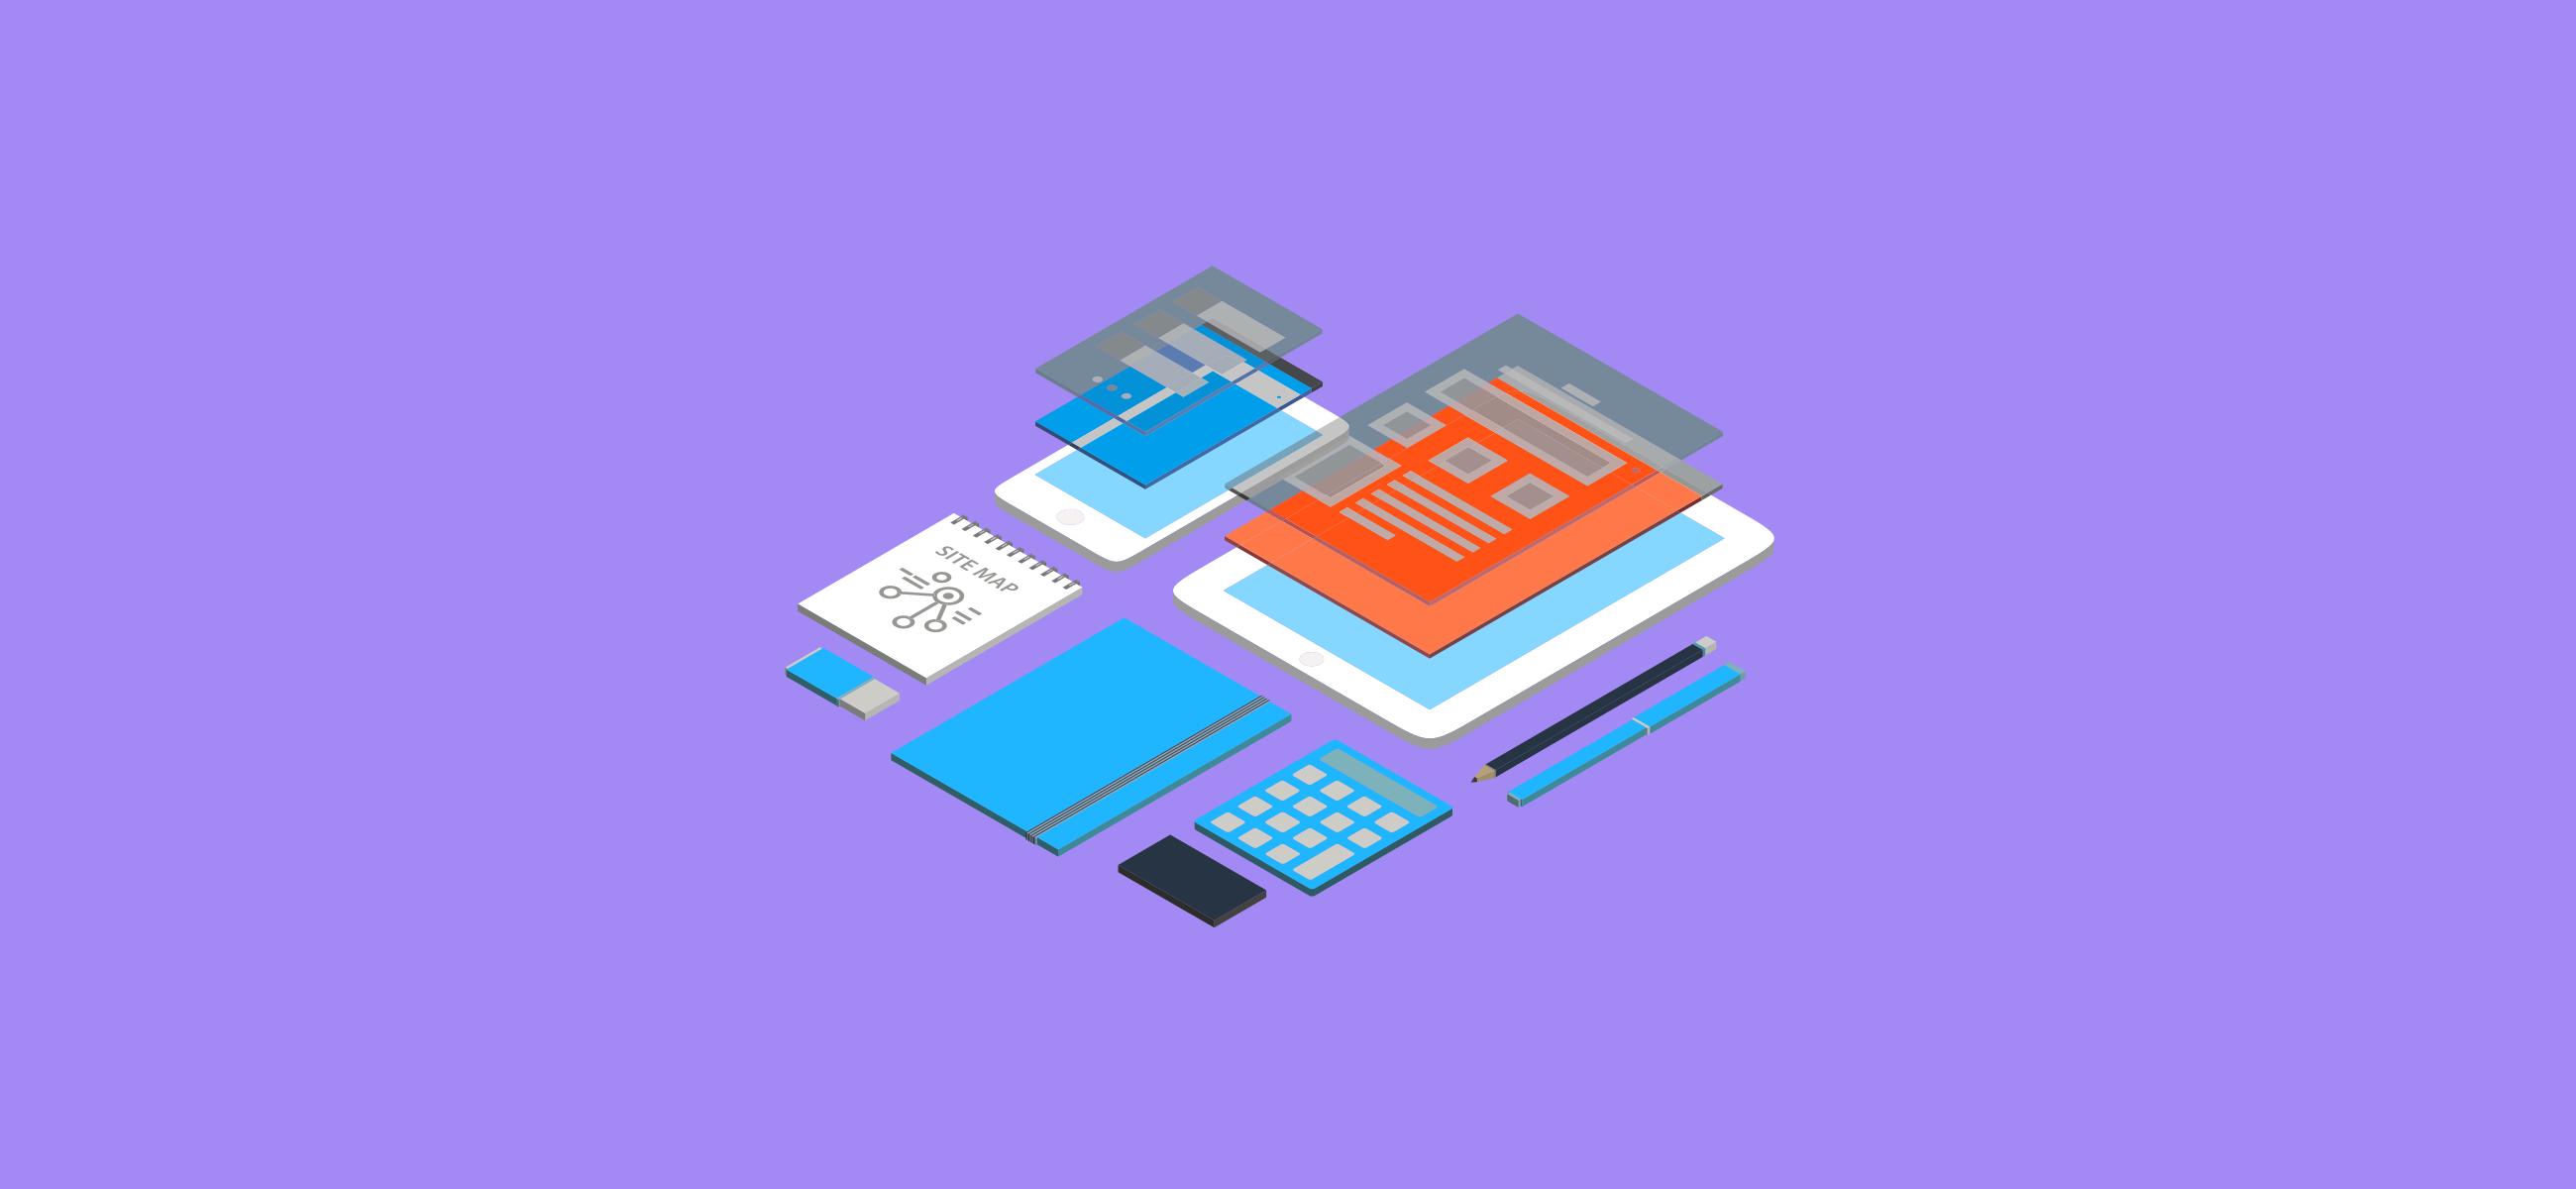 35 Great iOS UI Kits